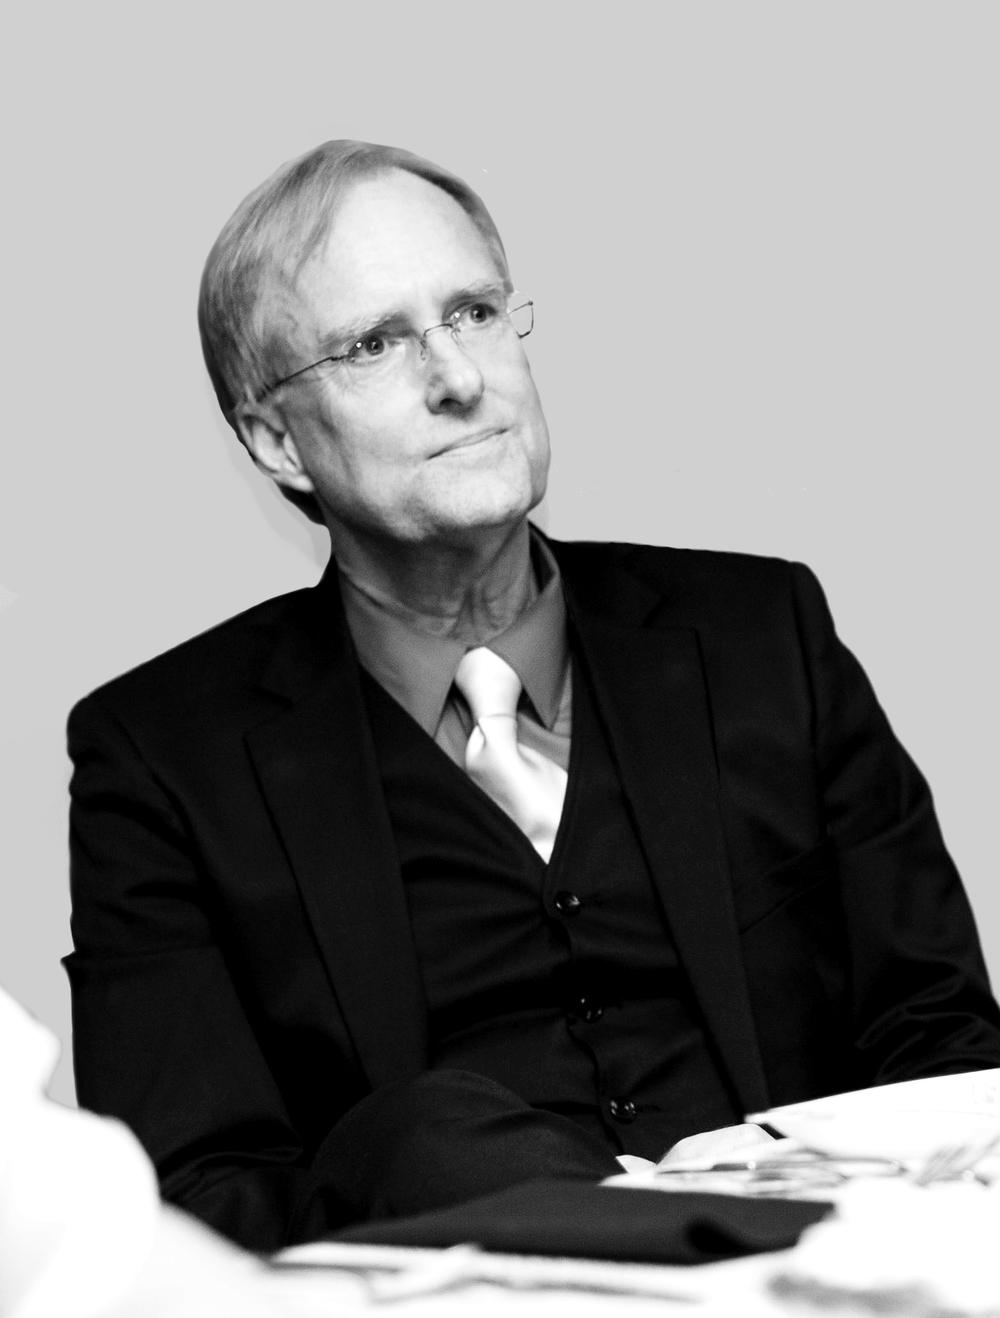 Dr. Craig Barton